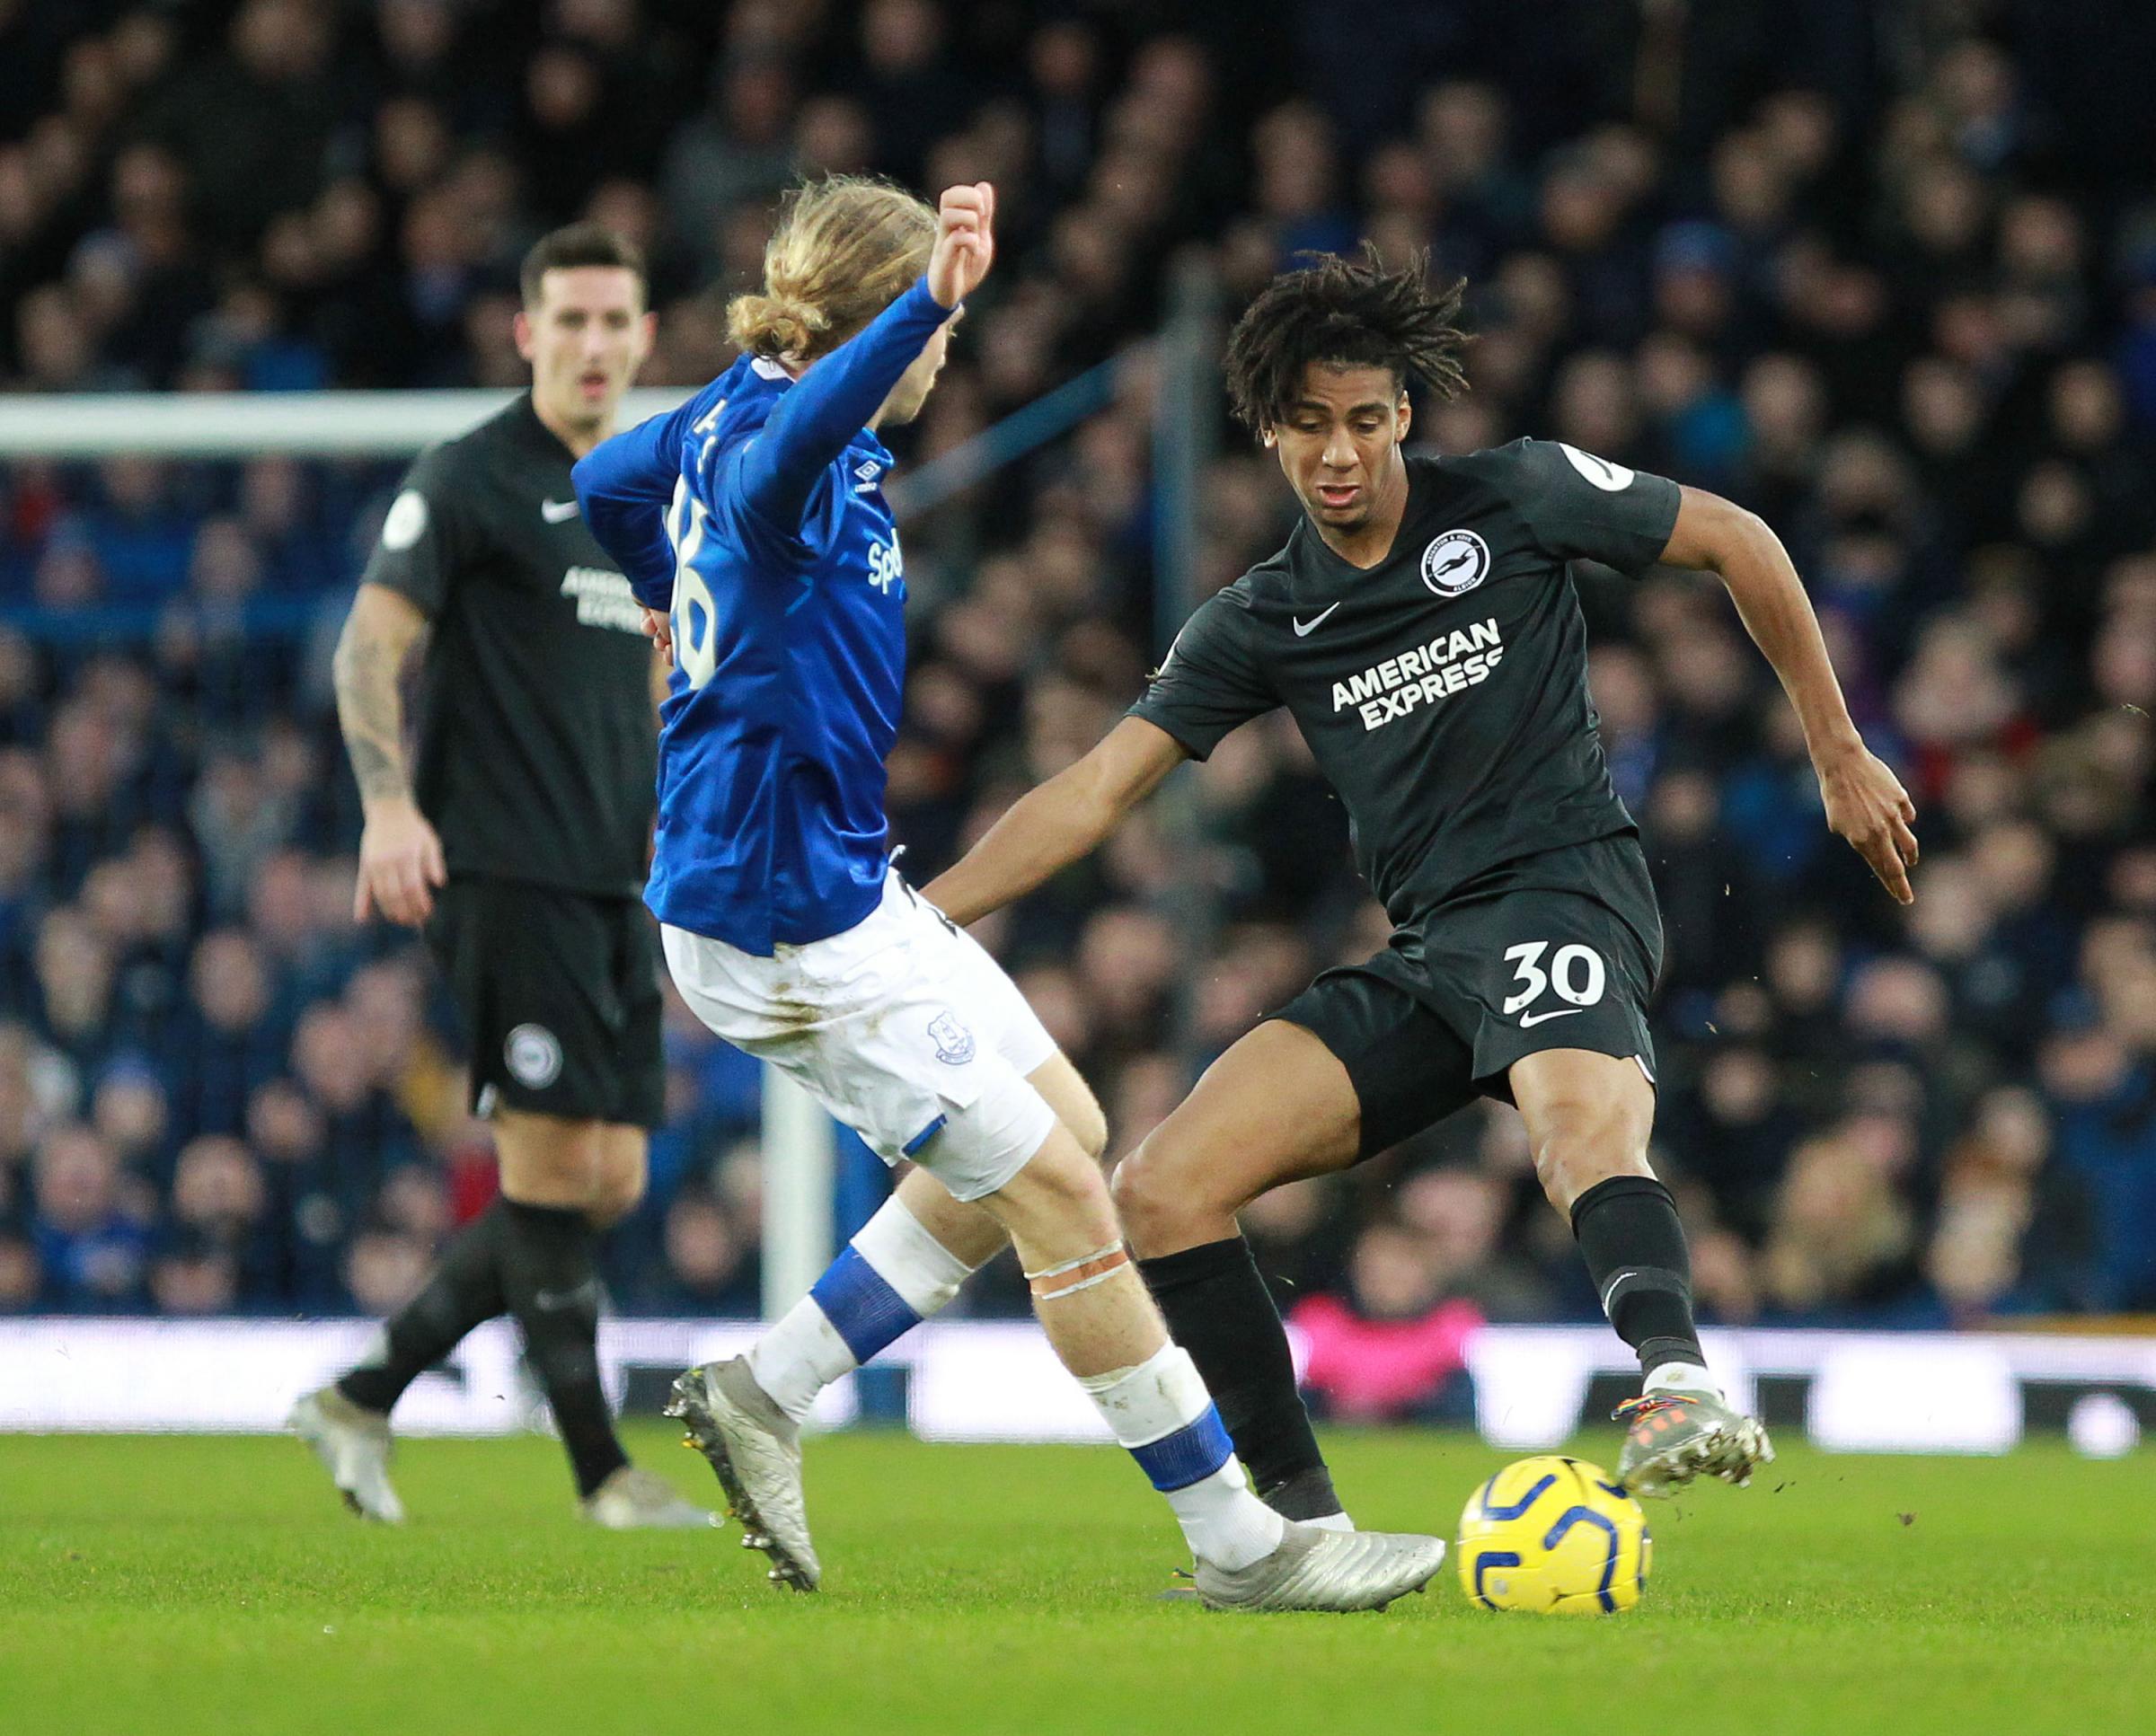 Bernardo ready for Villa six-pointer